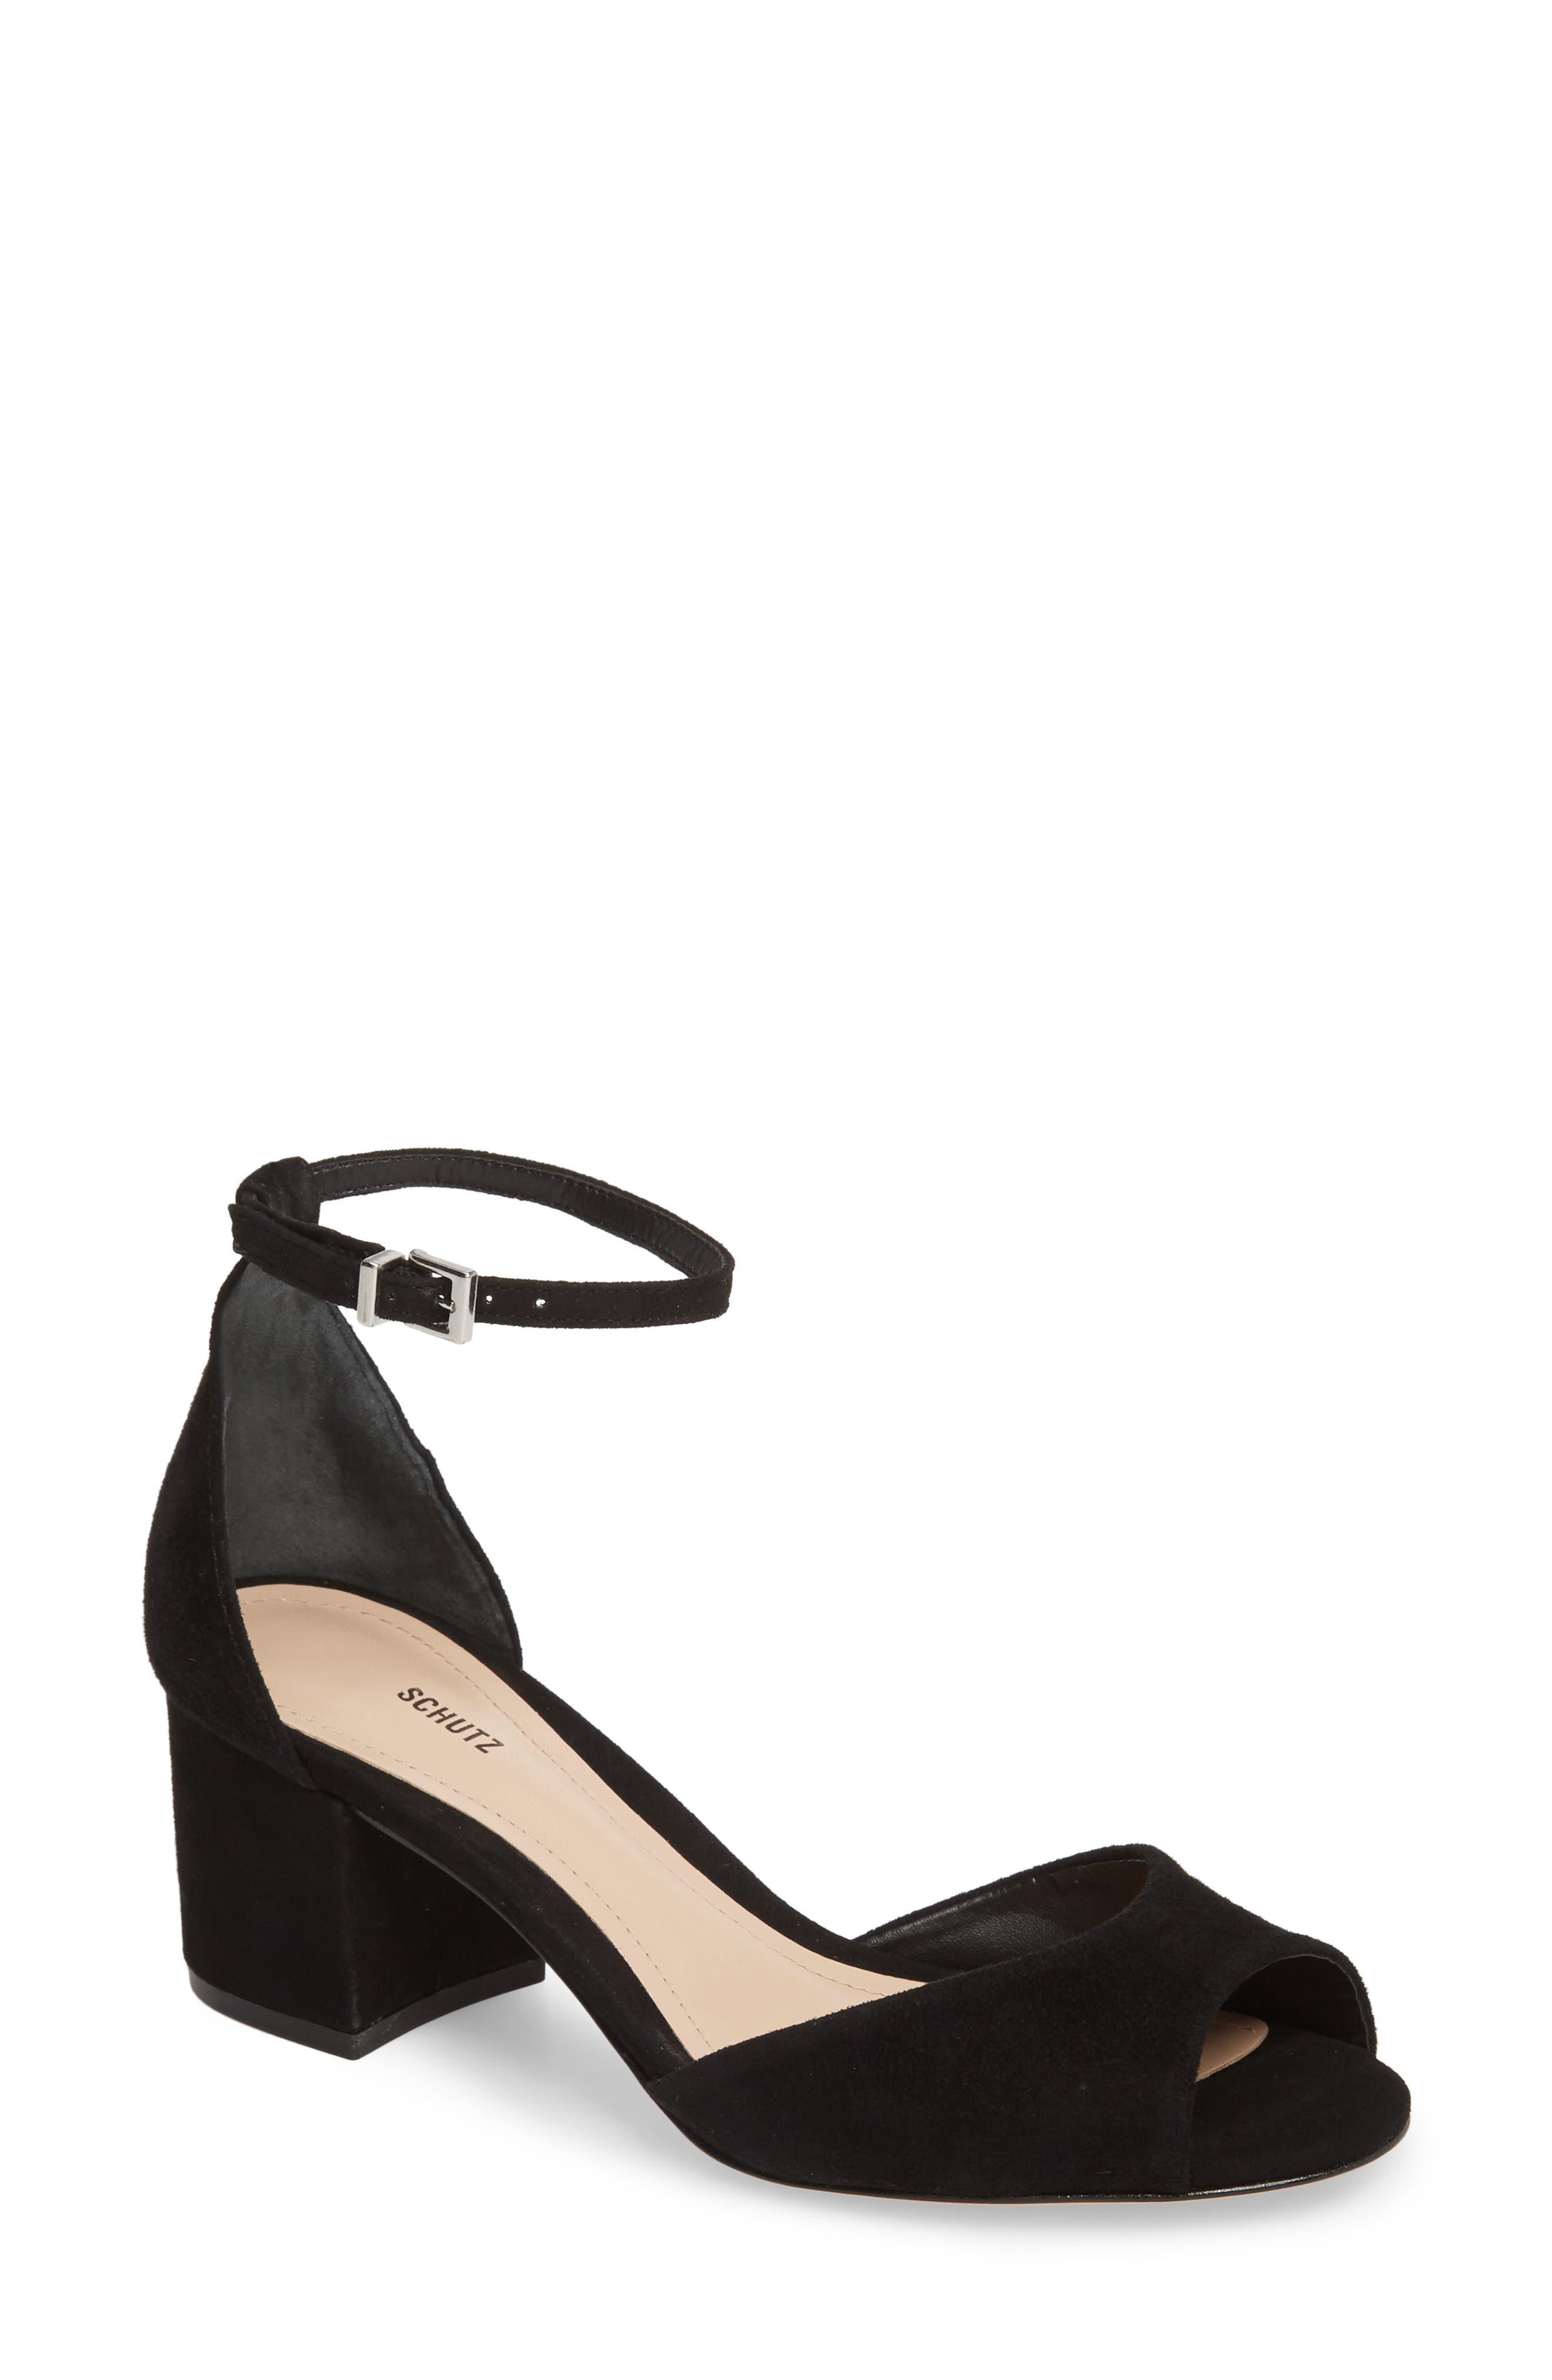 Schutz Roama Block Heel Sandal (Women)